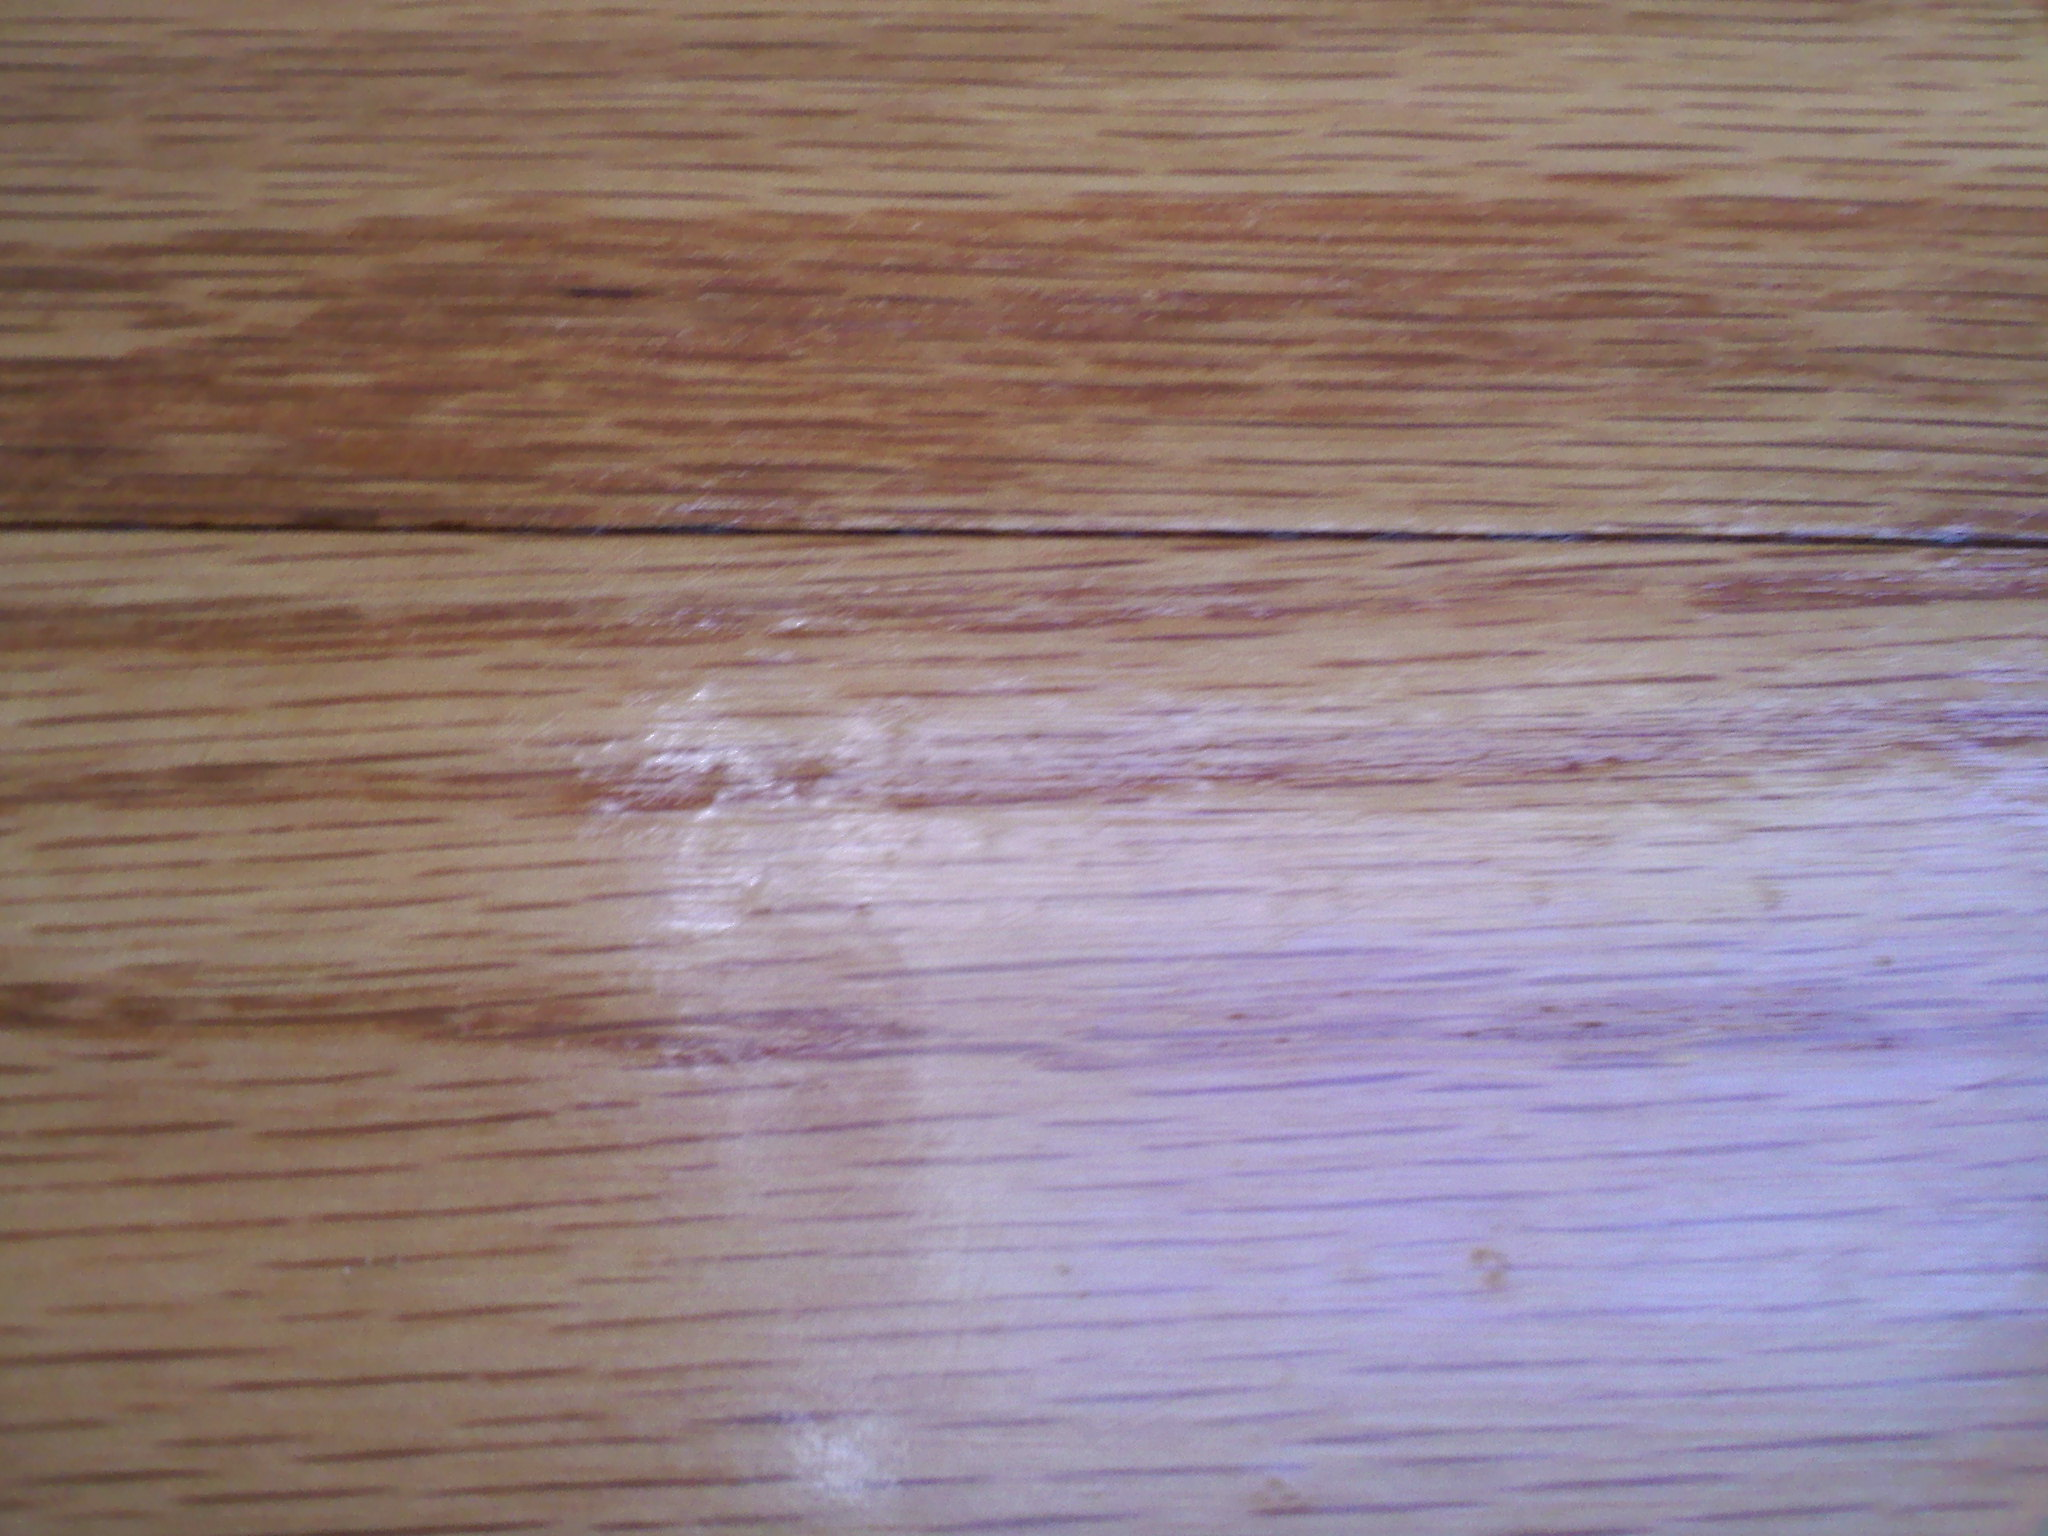 Cost Of Refinishing Wood Floors - Wavyfloors jpg refinished wood floors wavy gritty jpg